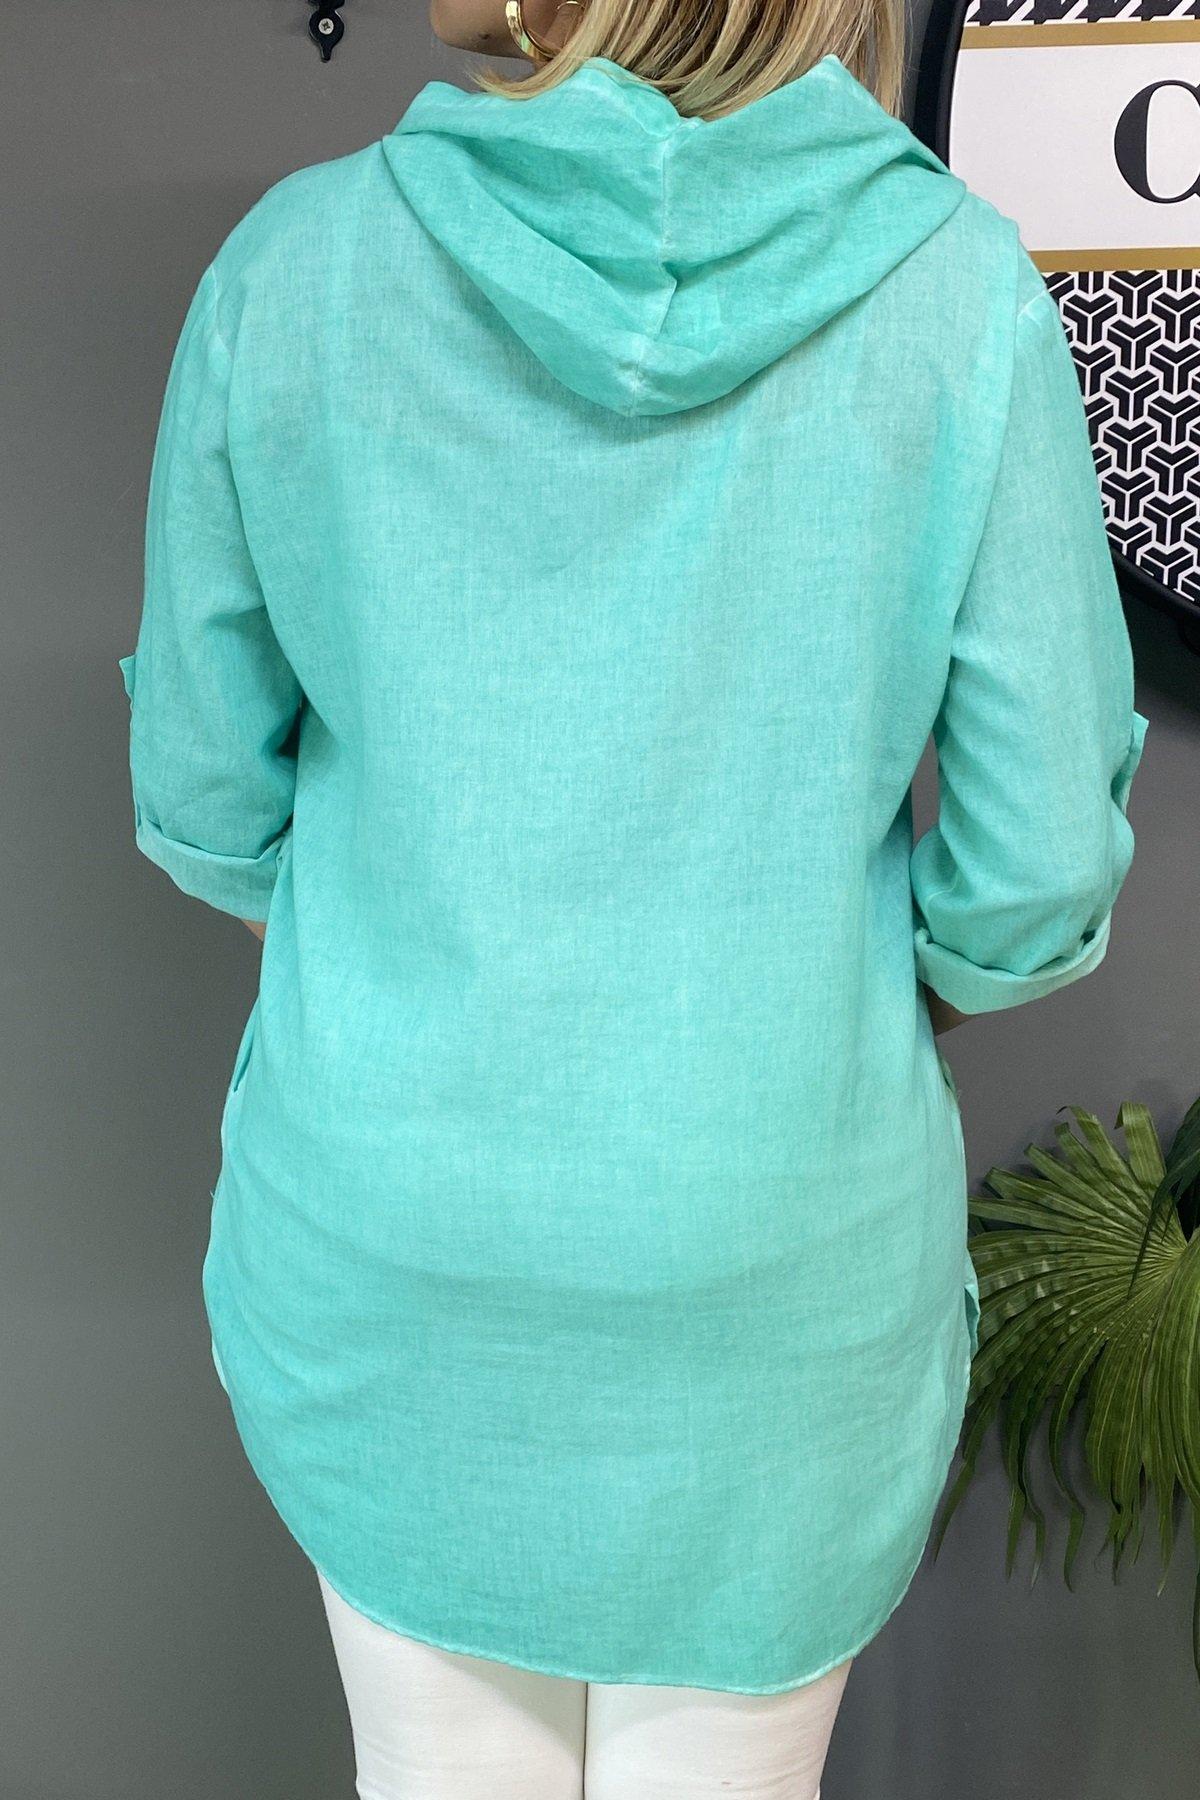 Kapüşonlu Göğüs Üstü Çift Cepli Yanları Gizli Cep Detaylı Bluz